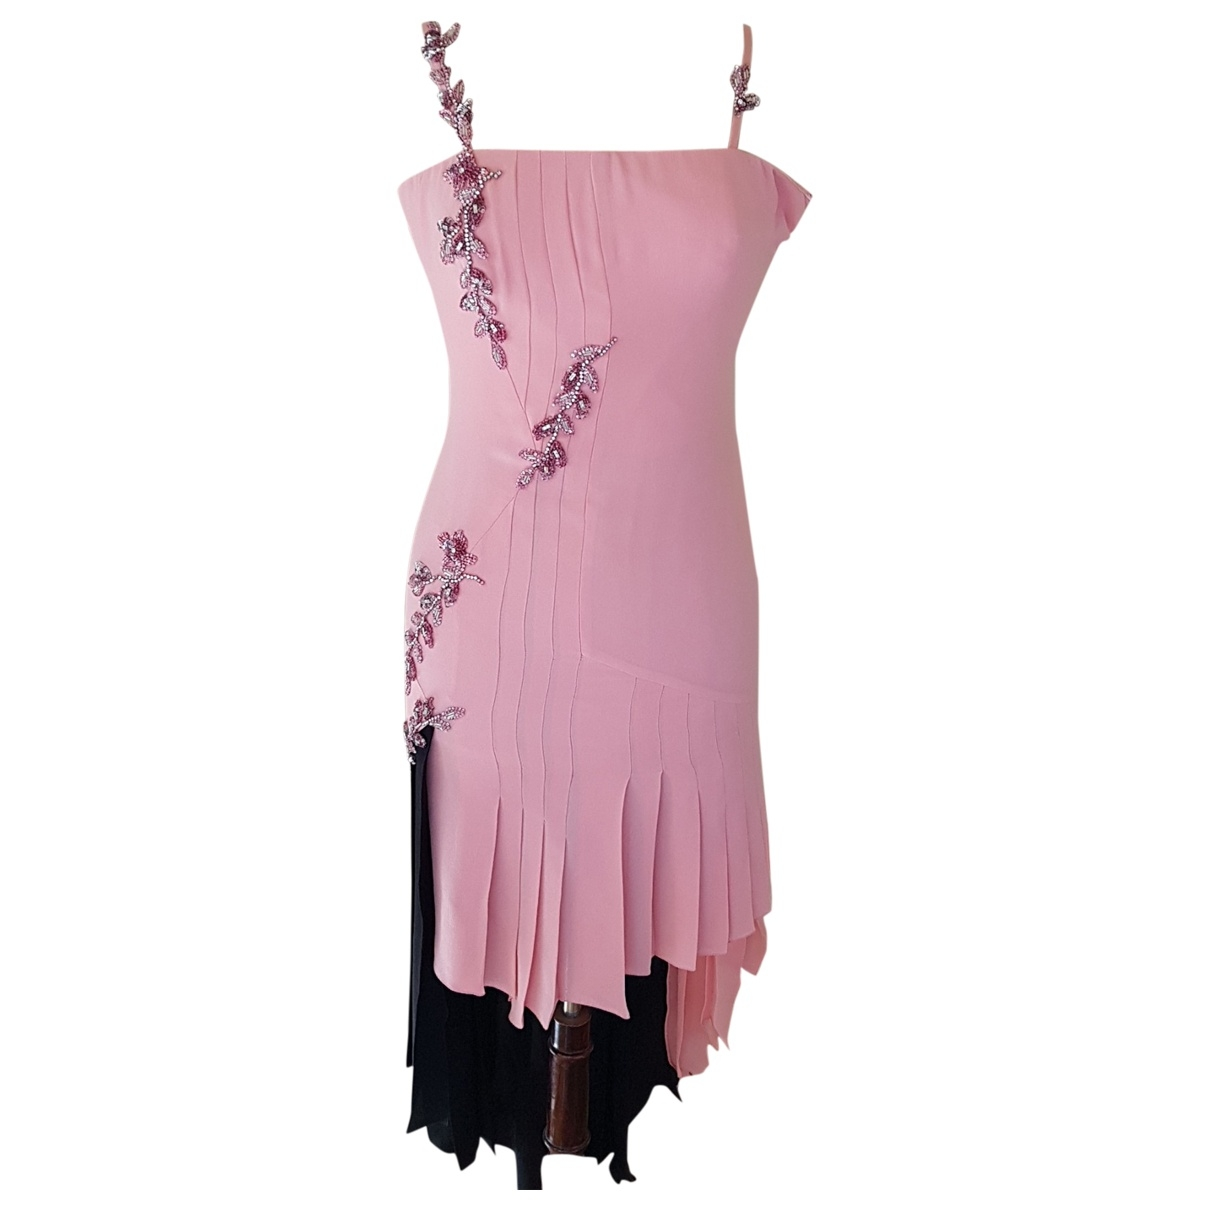 Gianni Versace \N Multicolour Silk dress for Women 40 IT